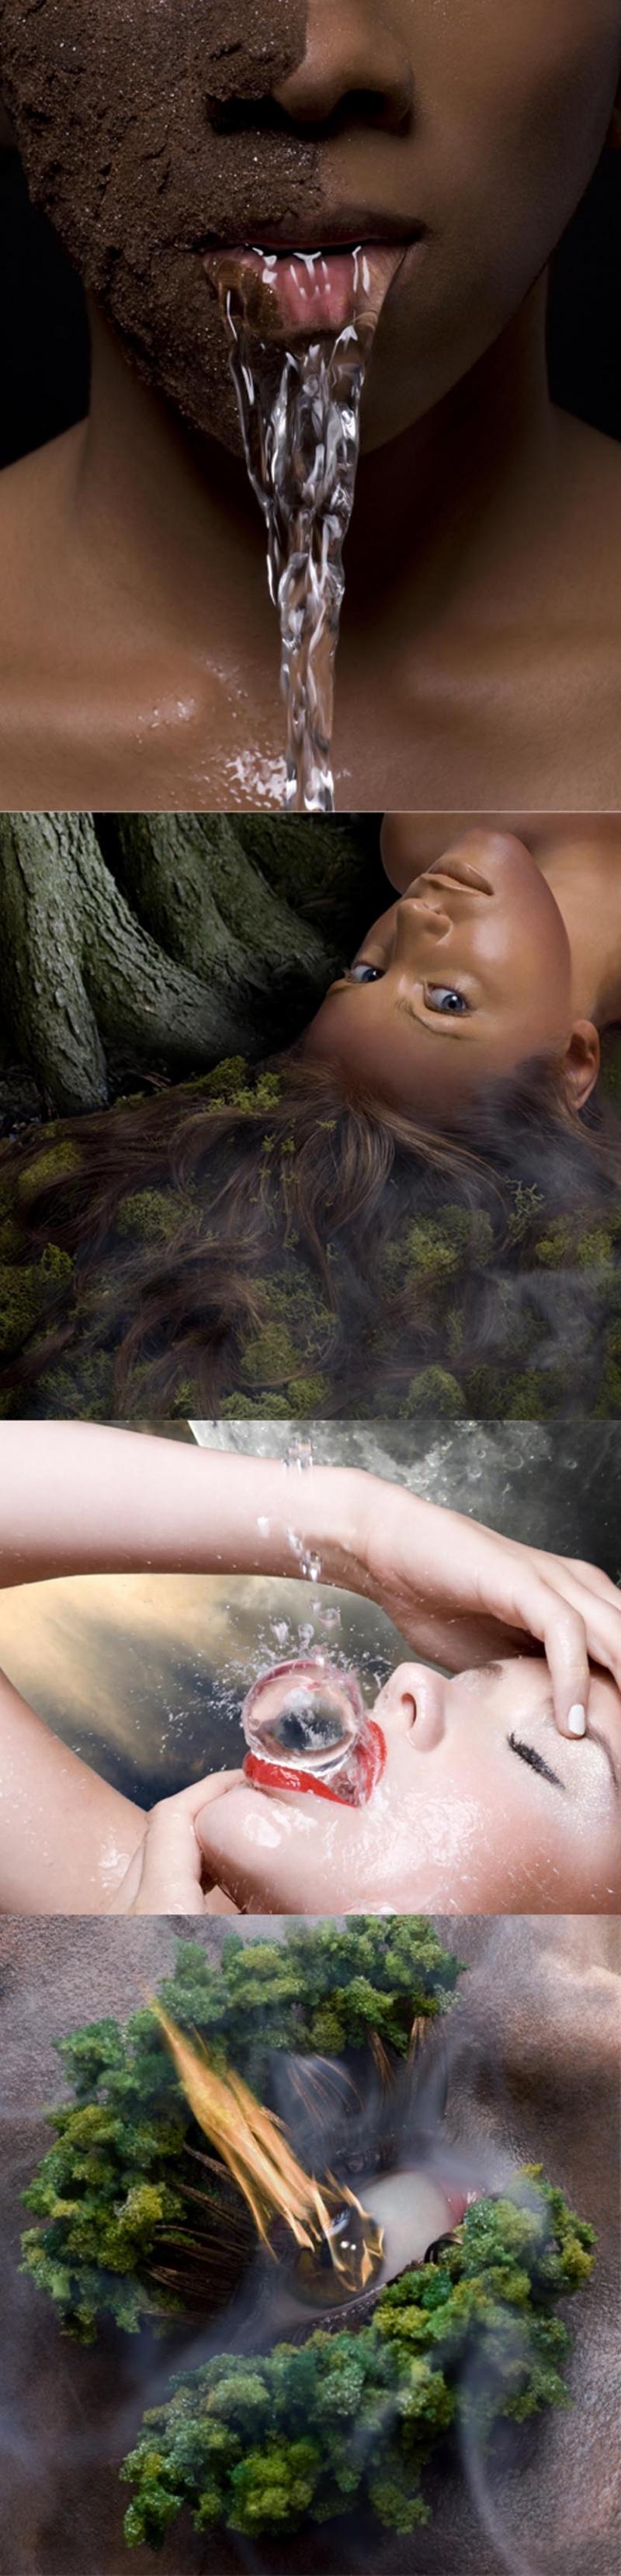 Apr 16, 2010 ©Taichi Imai the Earth (Beauty series)